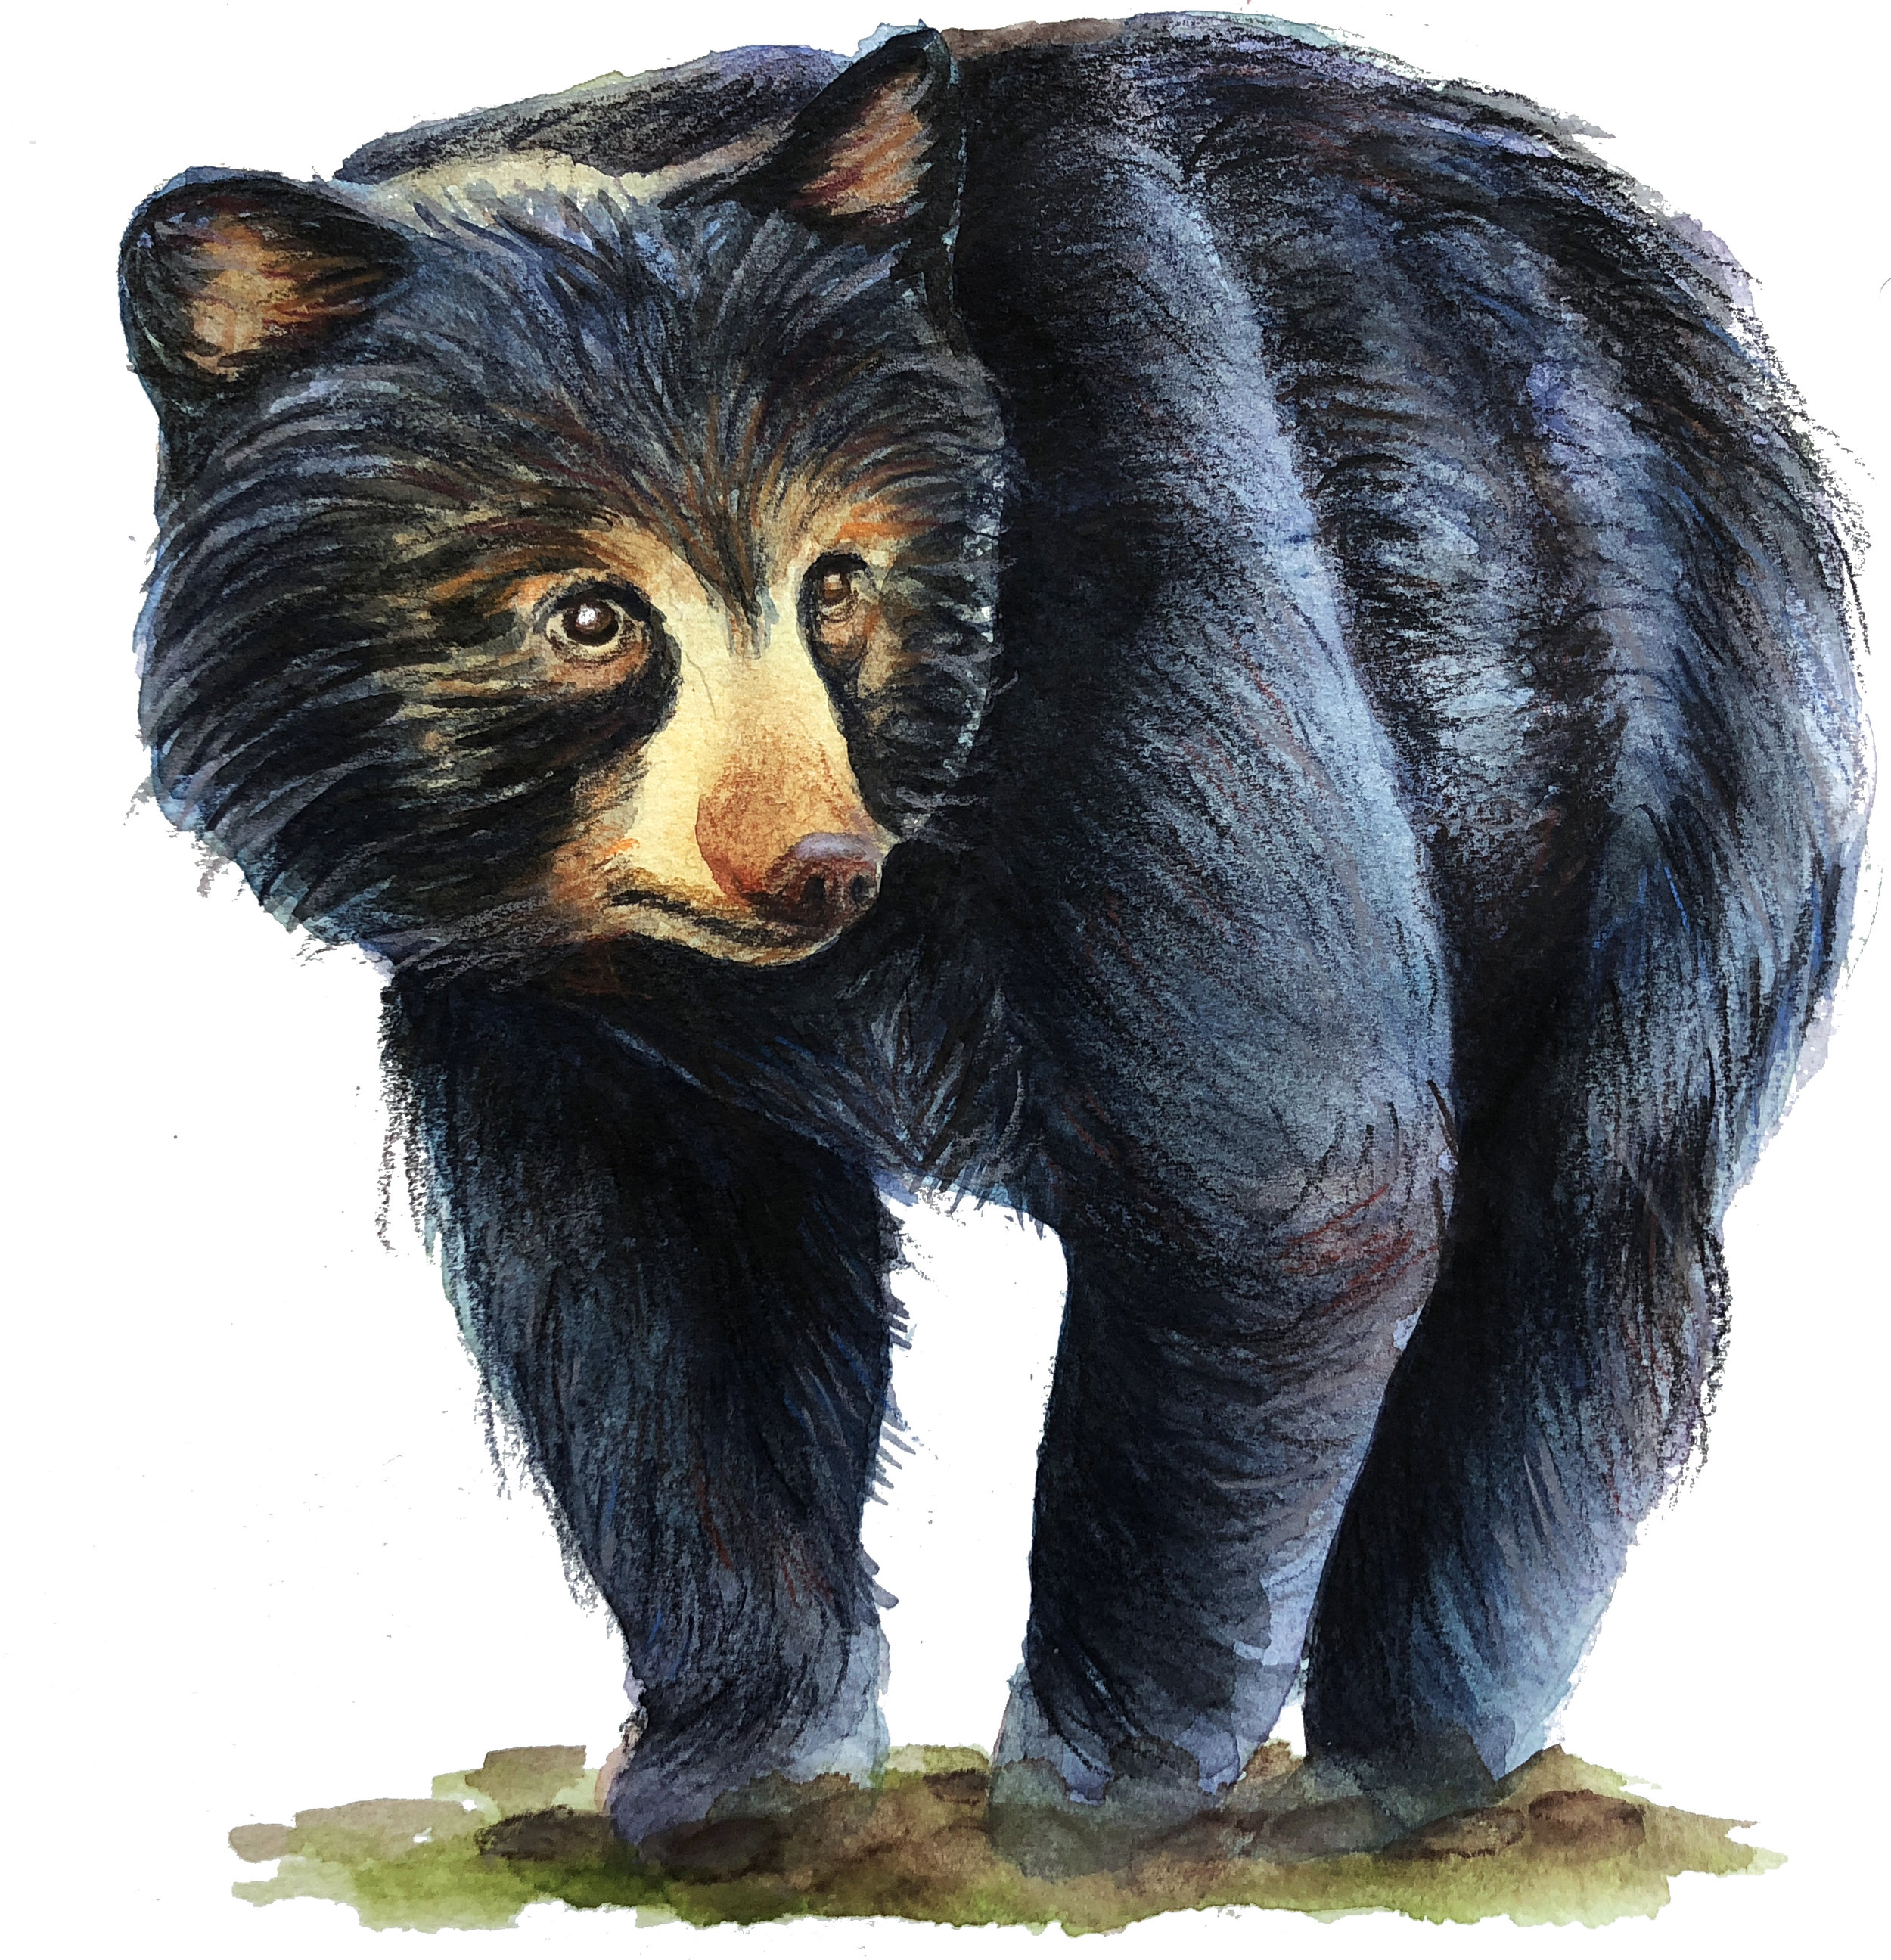 The Florida Black Bear